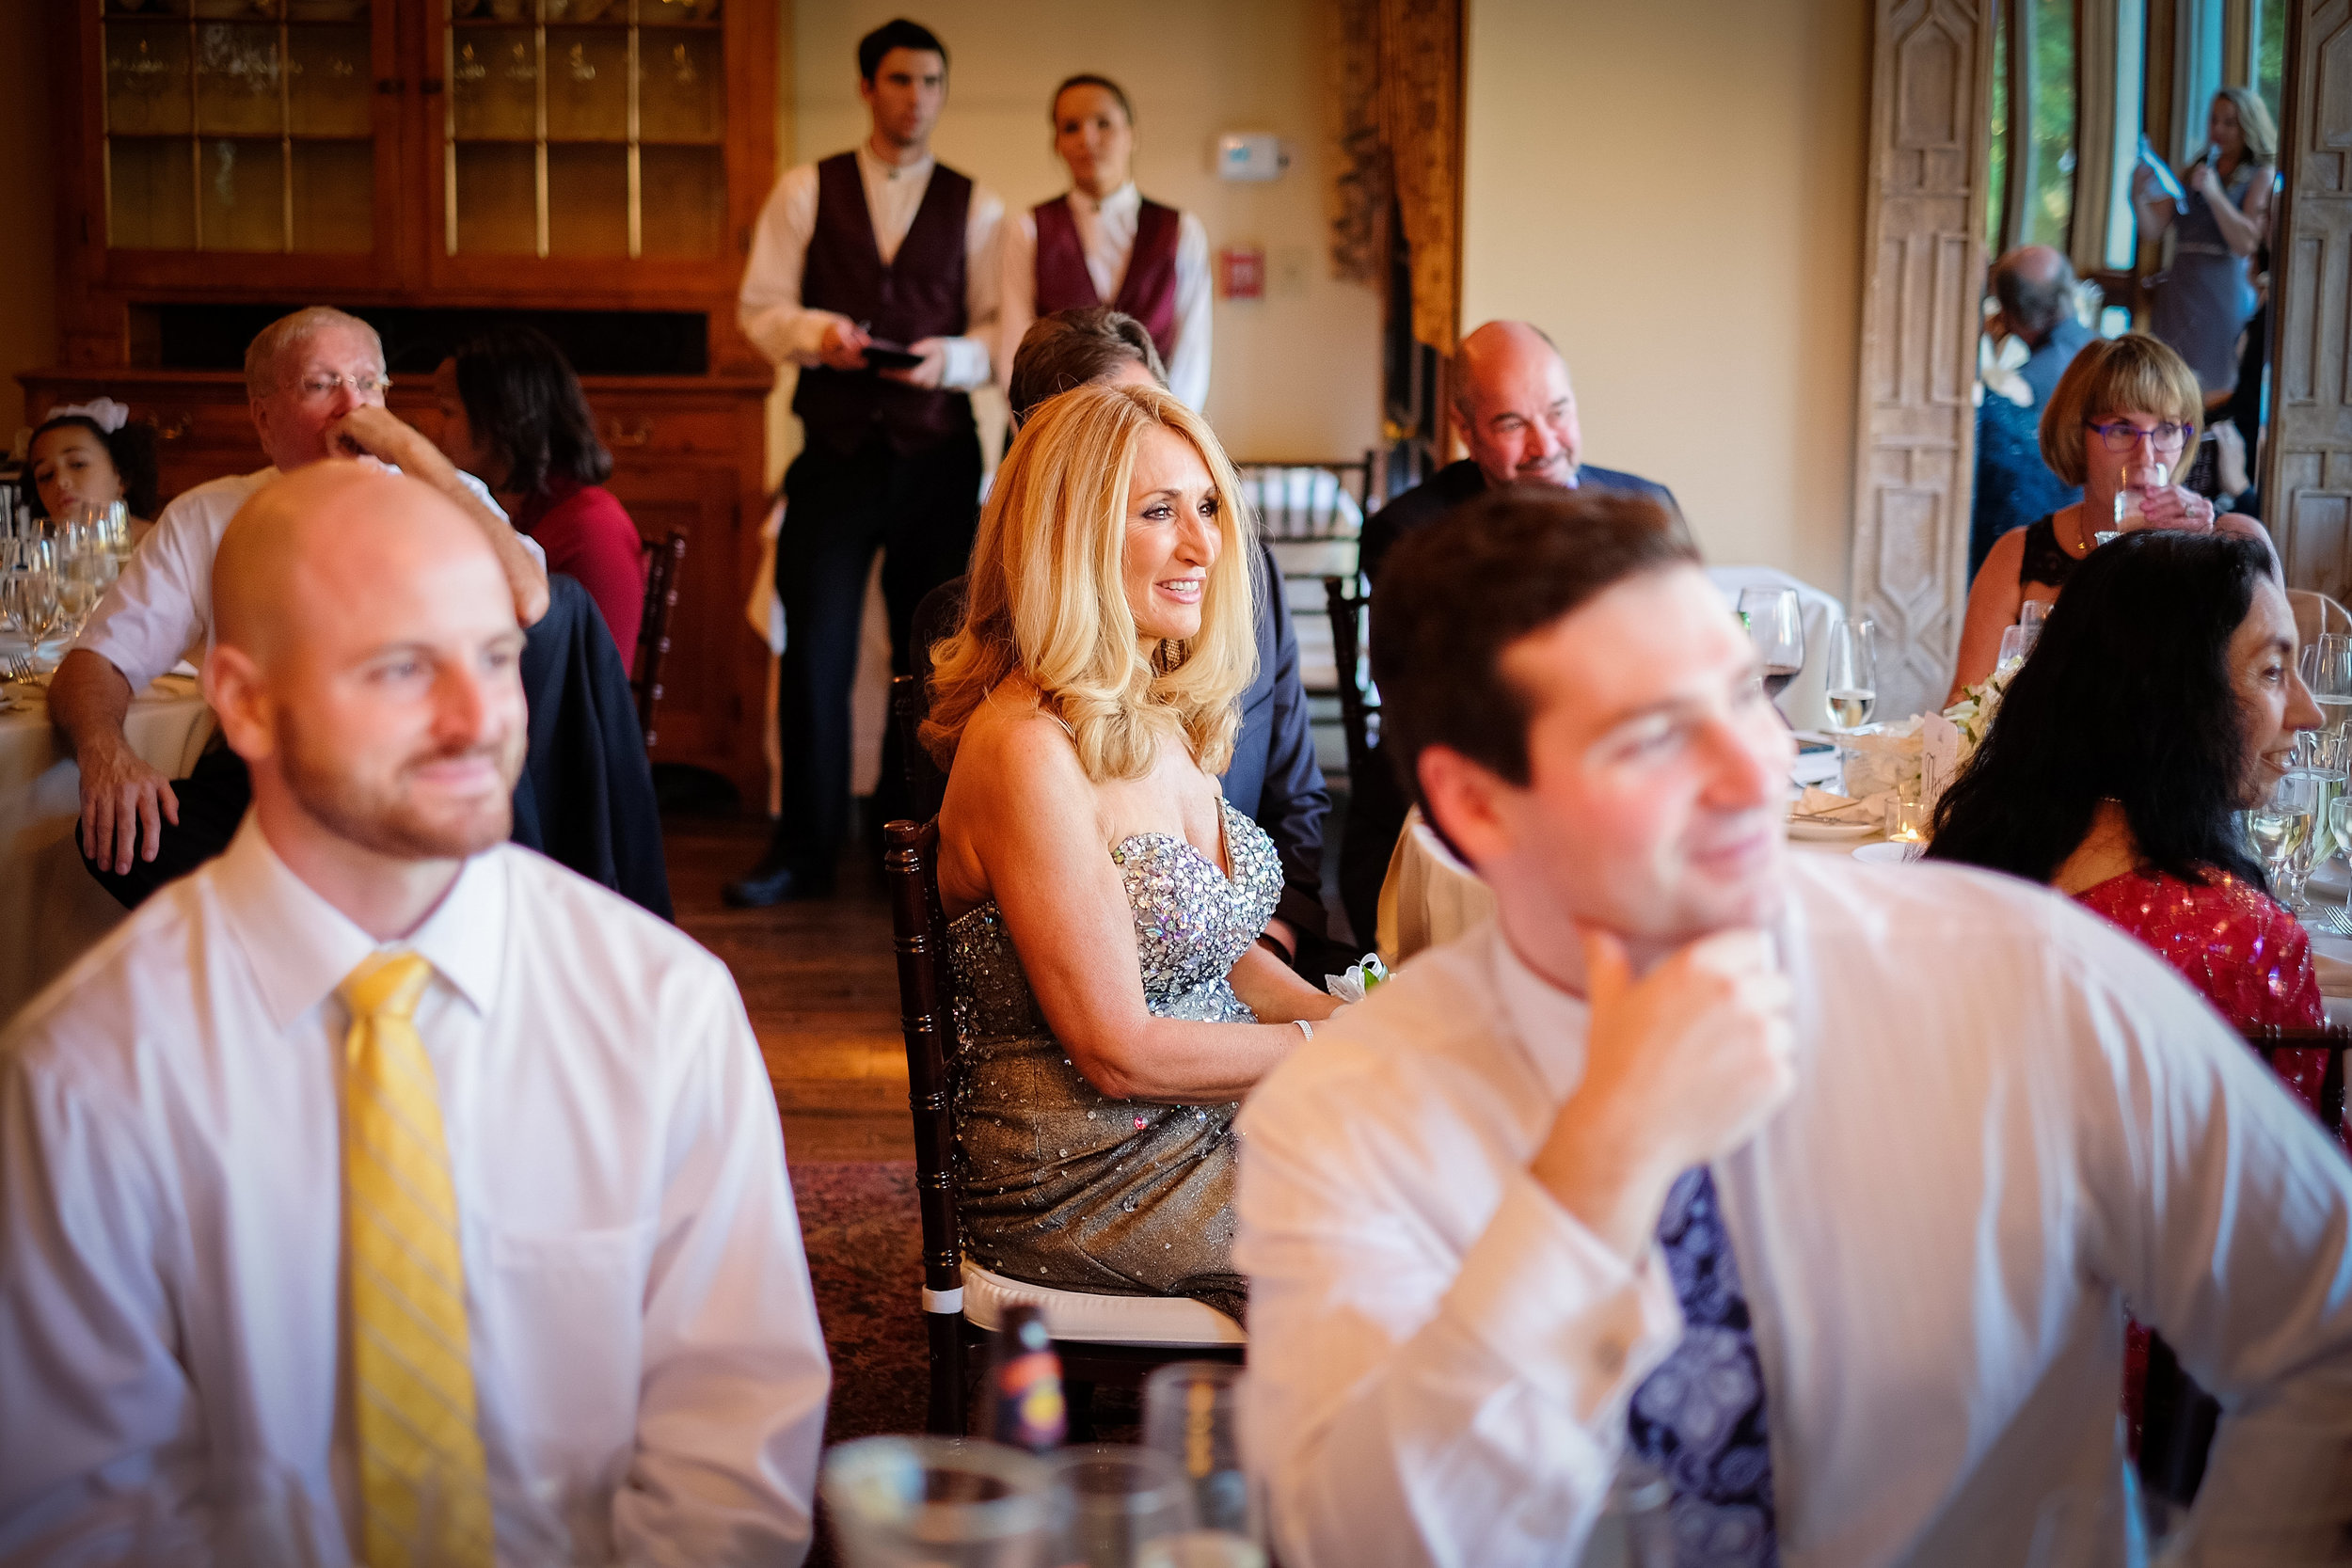 bedford-nh-wedding-photography-520.jpg